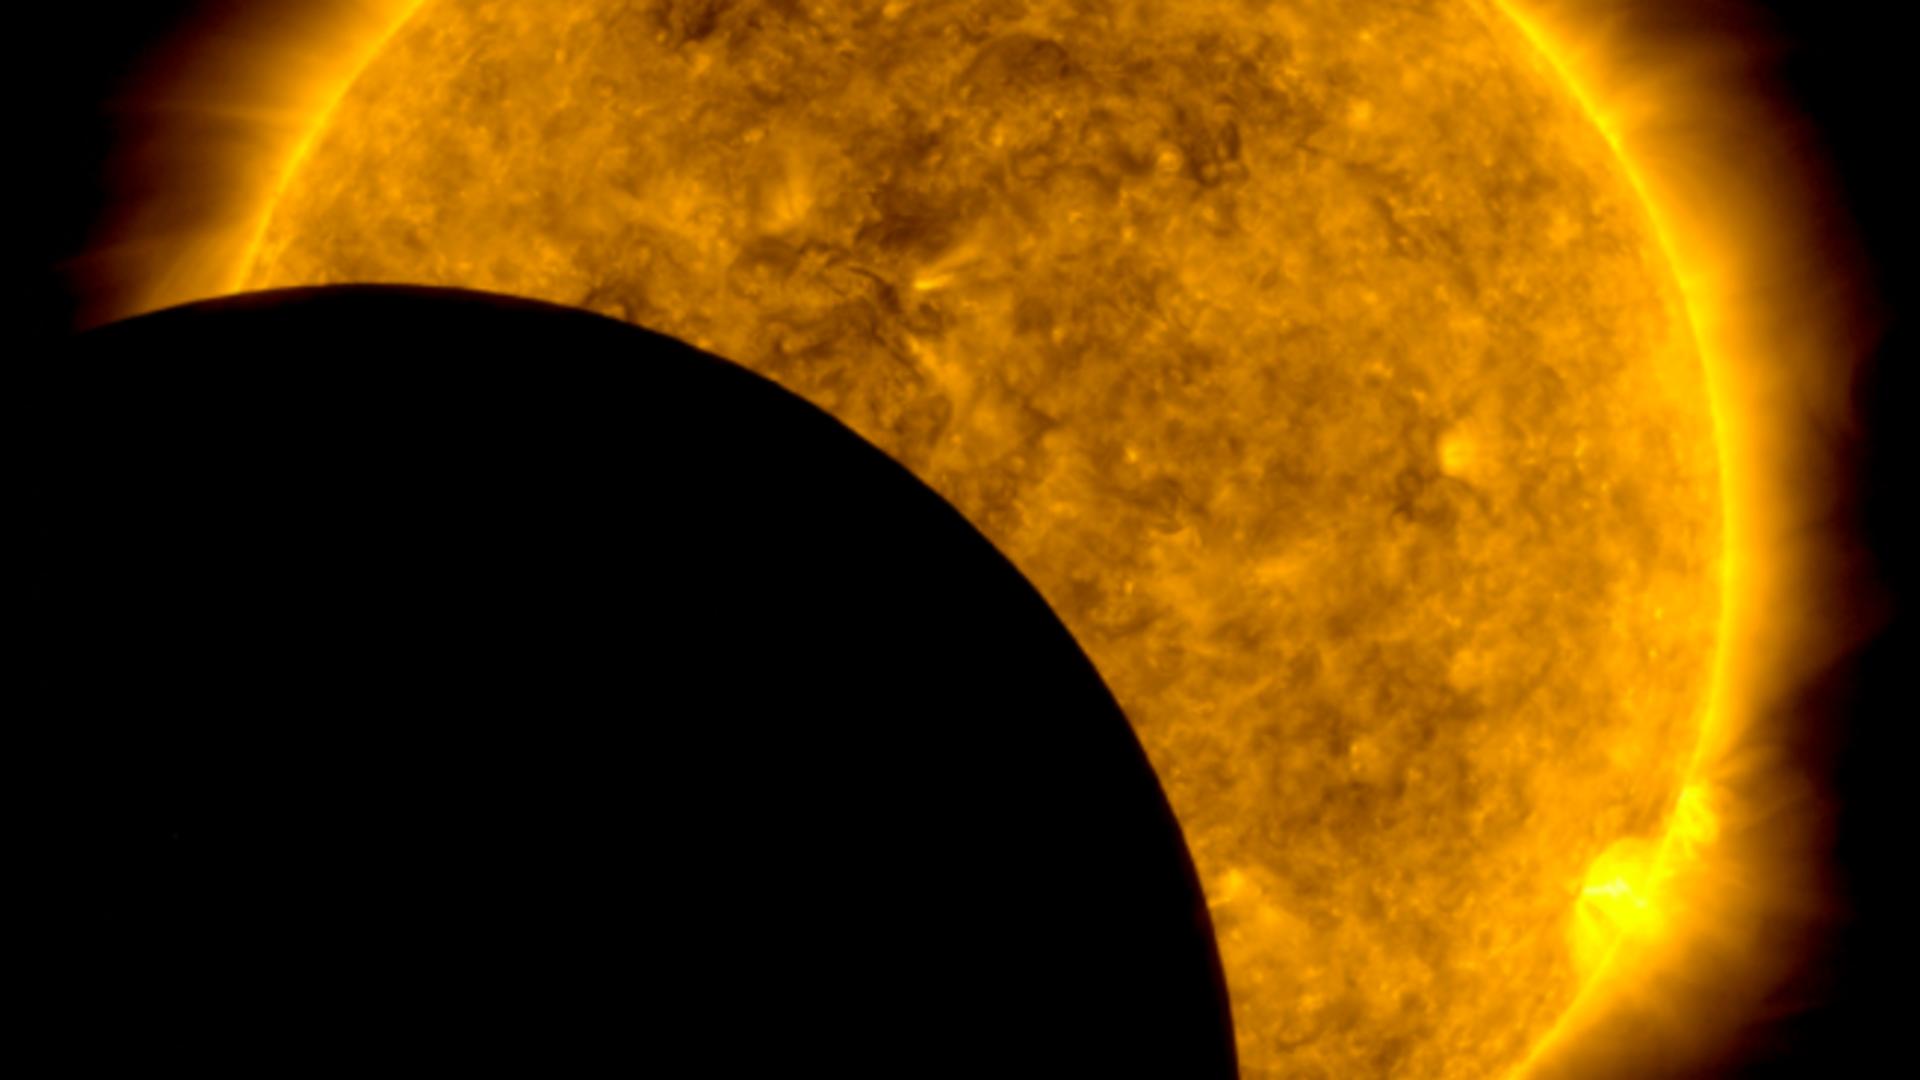 Sole e Luna - Sputnik Italia, 1920, 29.05.2021